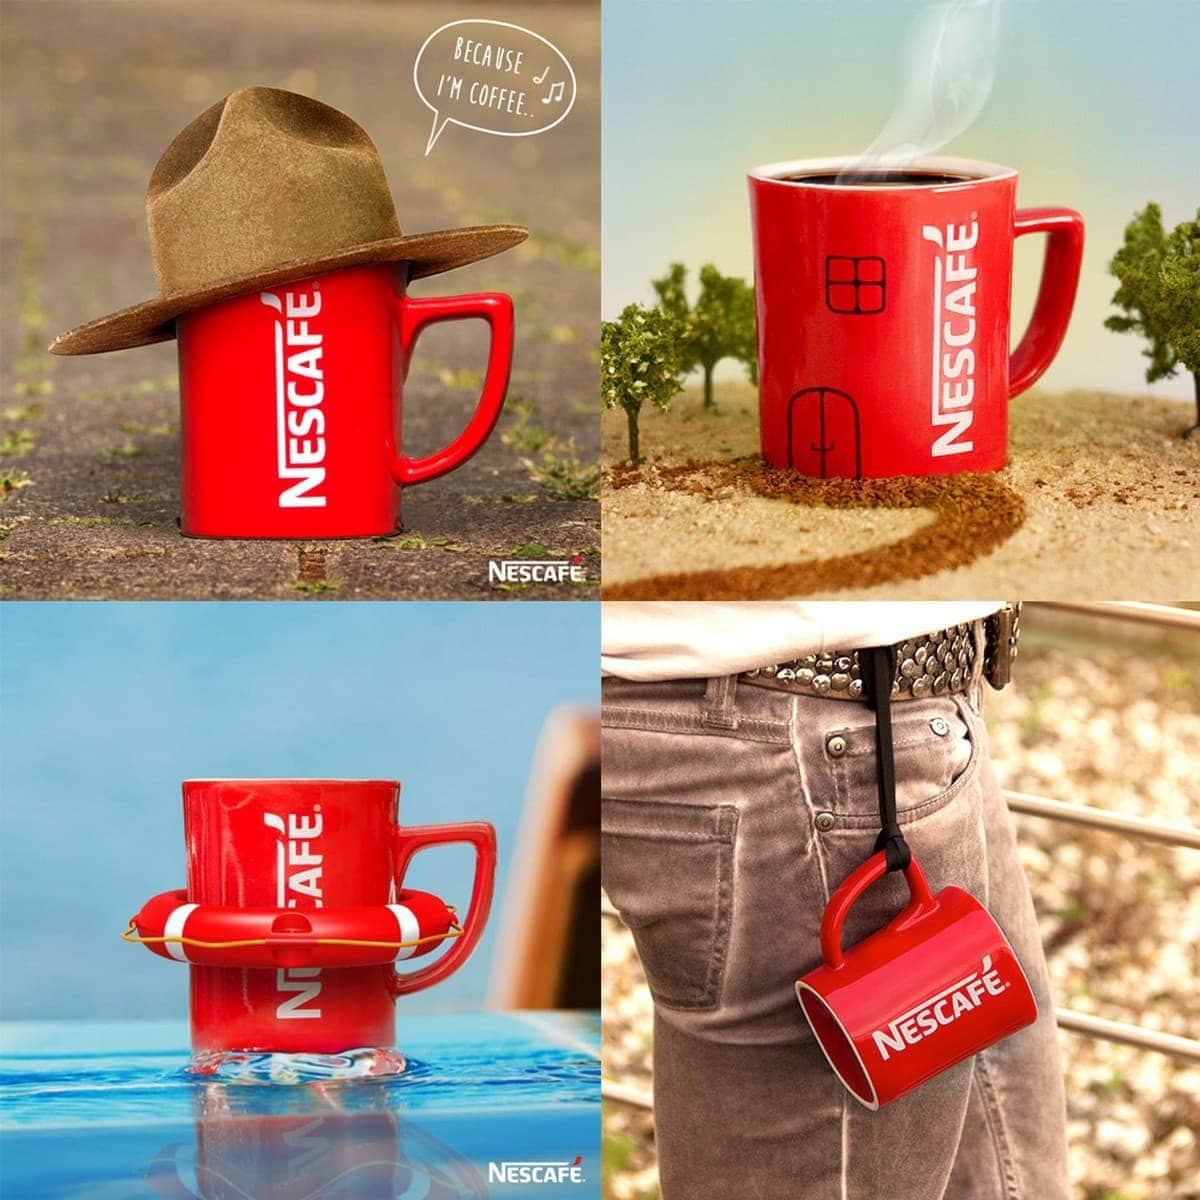 Marketing Strategy of Nescafe – Nescafe Marketing Strategy